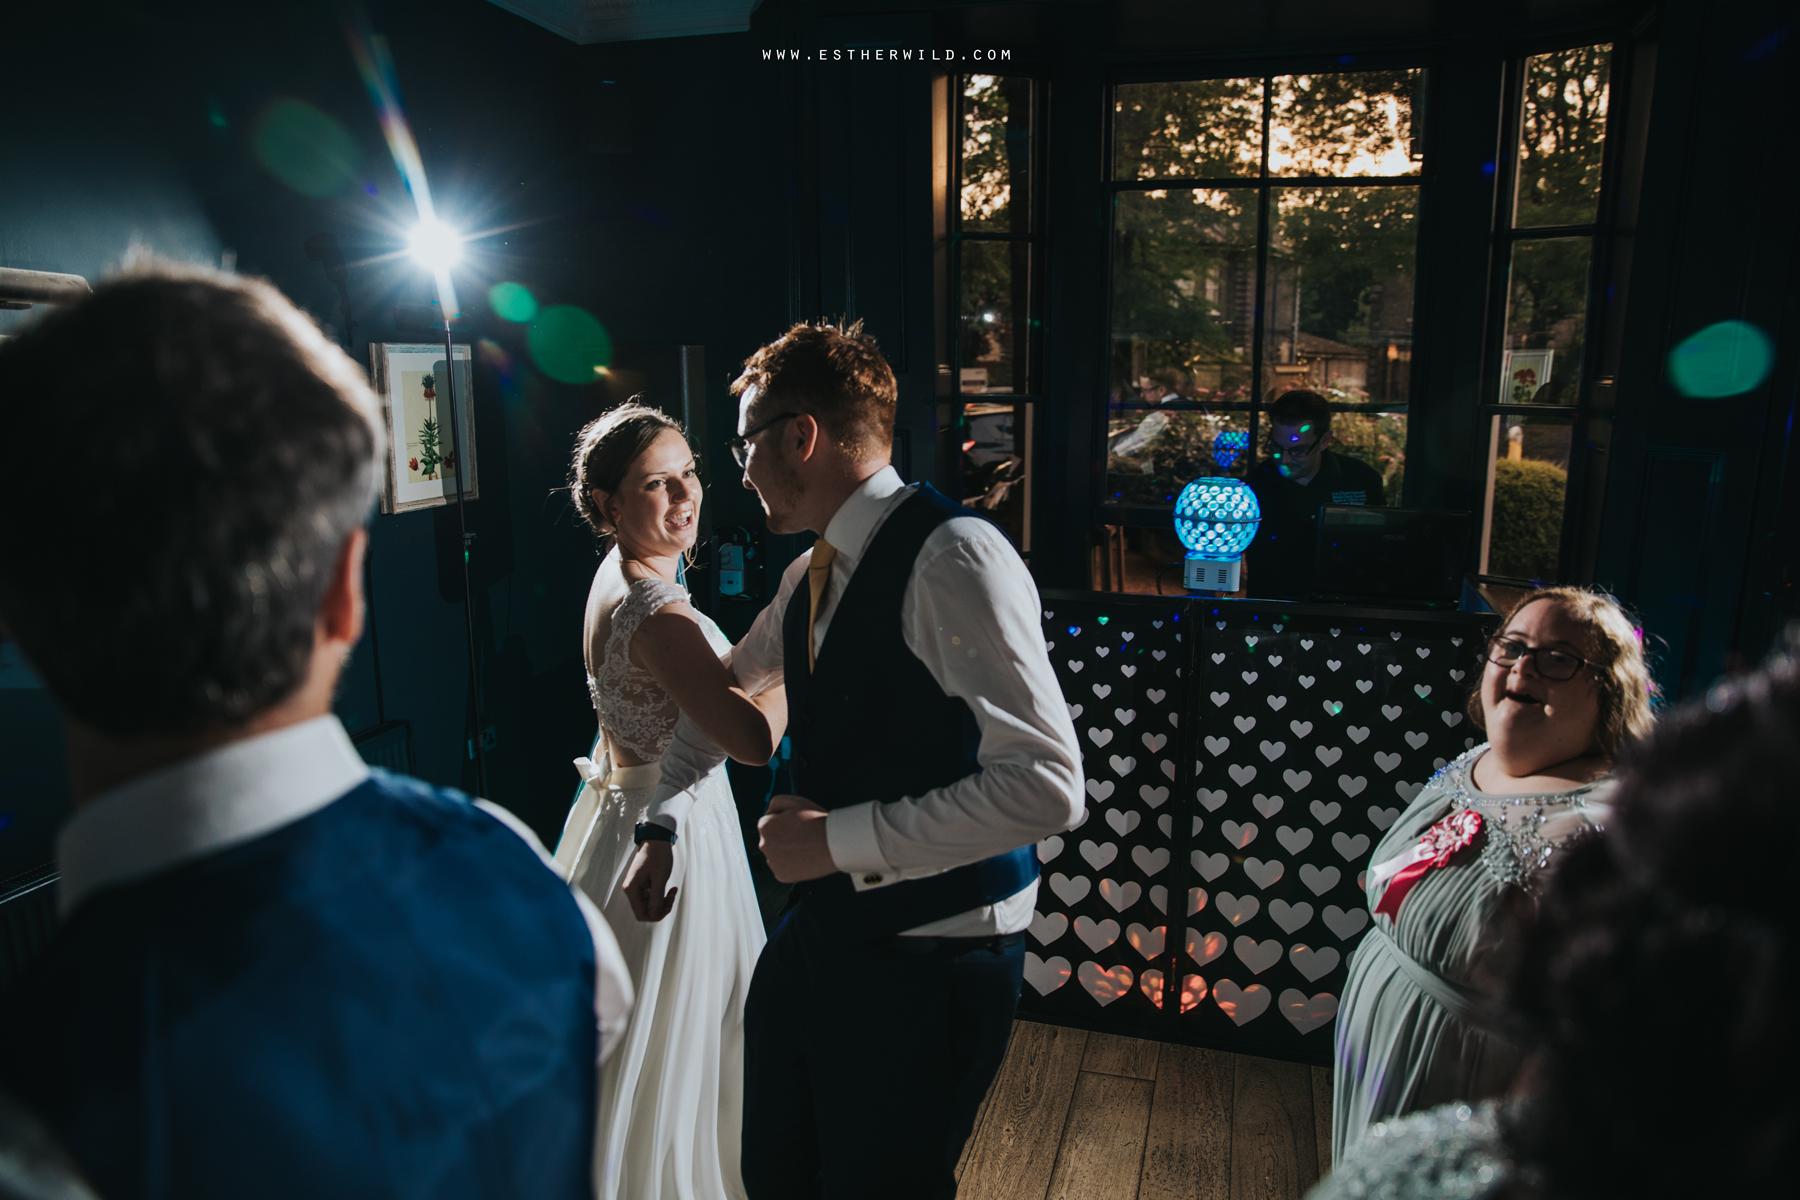 The_Georgian_Townhouse_Wedding_Norwich_Esther_Wild_Photographer_3R8A3064.jpg